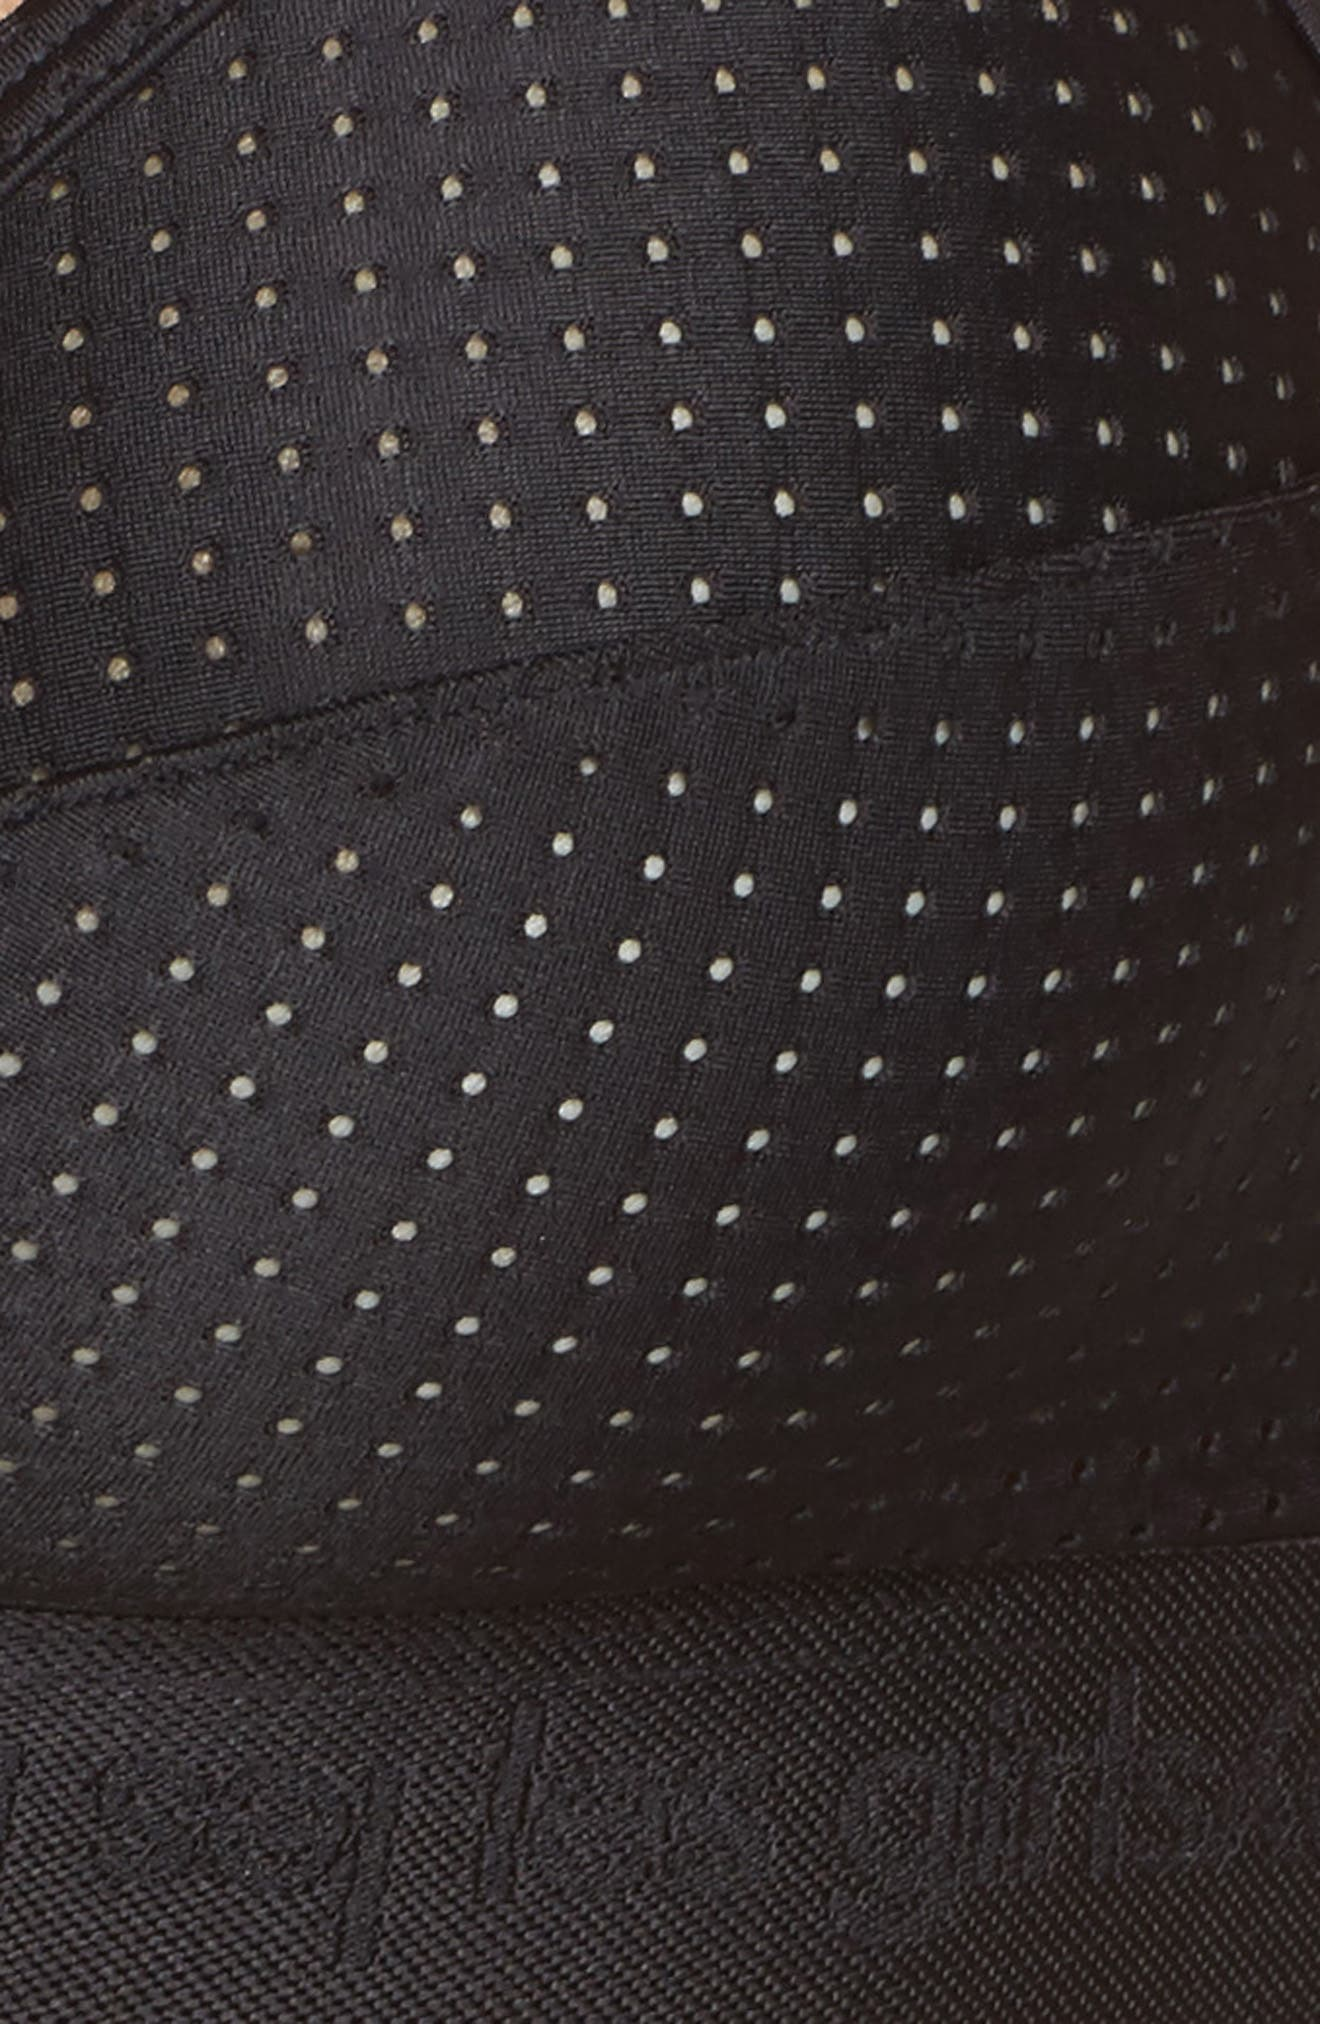 Triangle Bralette,                             Alternate thumbnail 11, color,                             Black